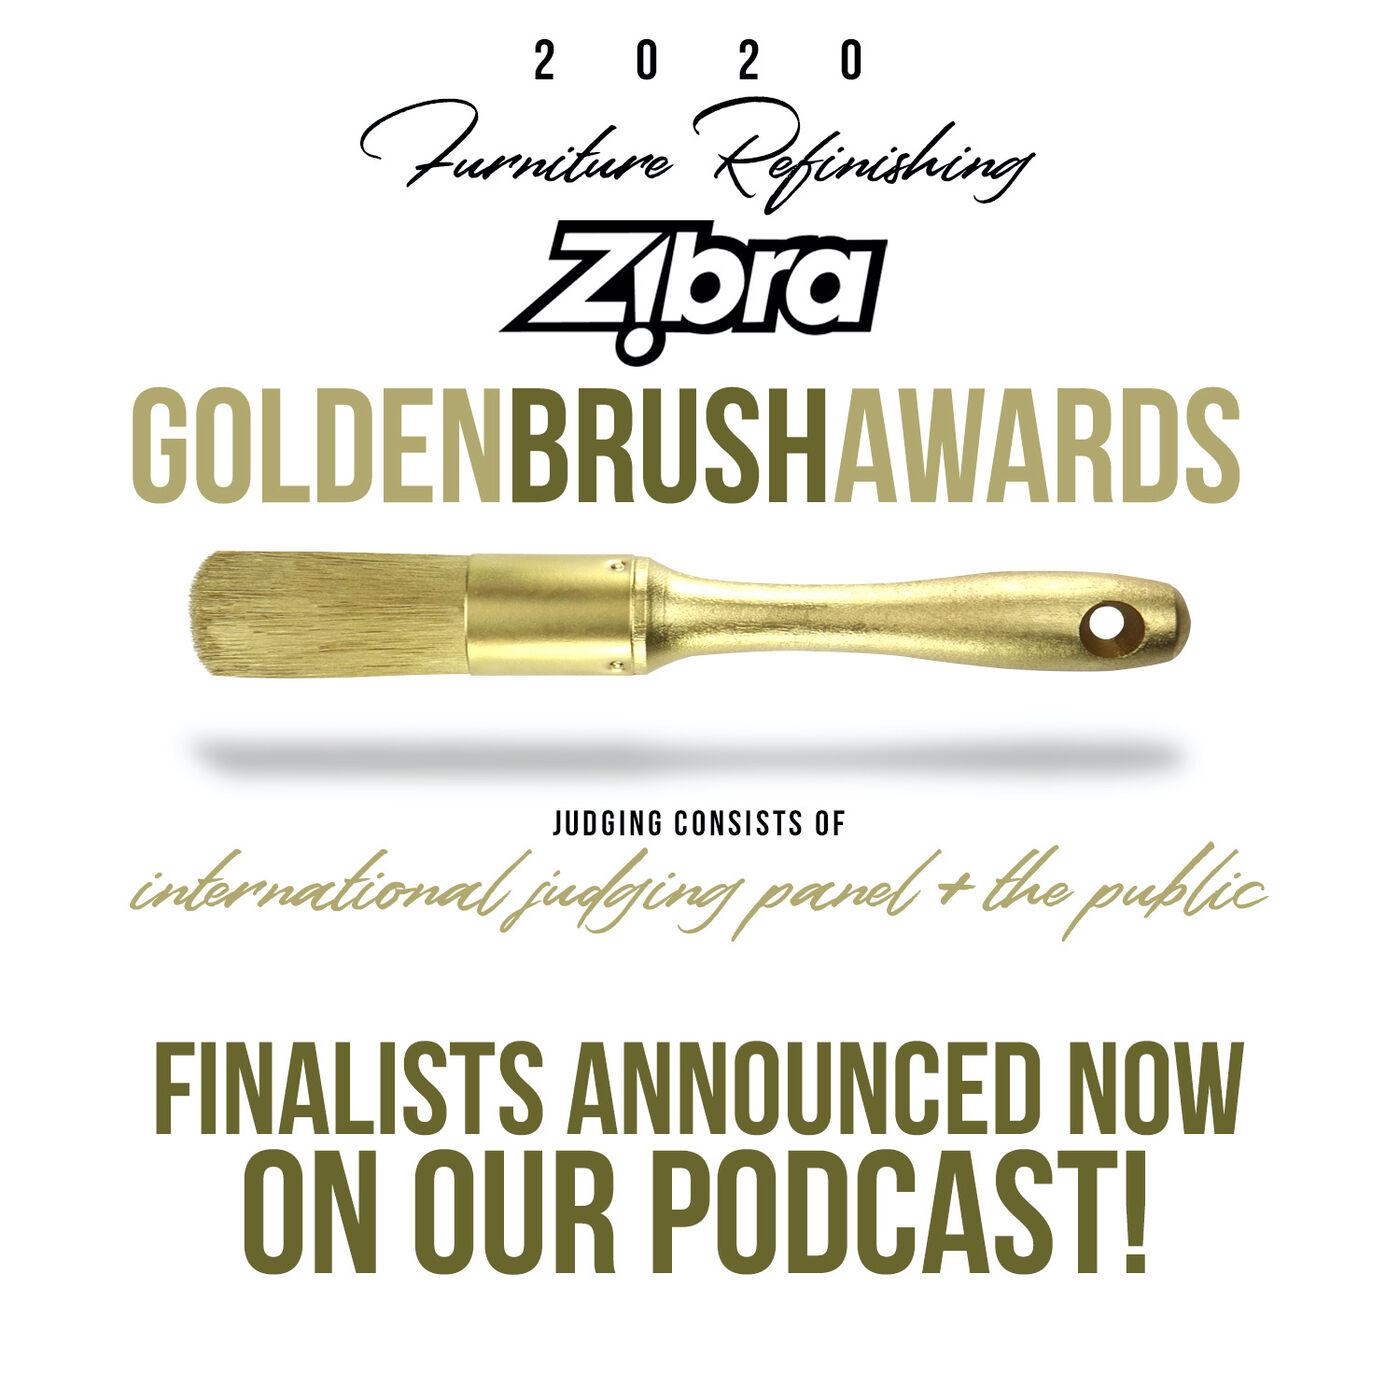 Announcing The Zibra's Golden Brush Awards Finalists!